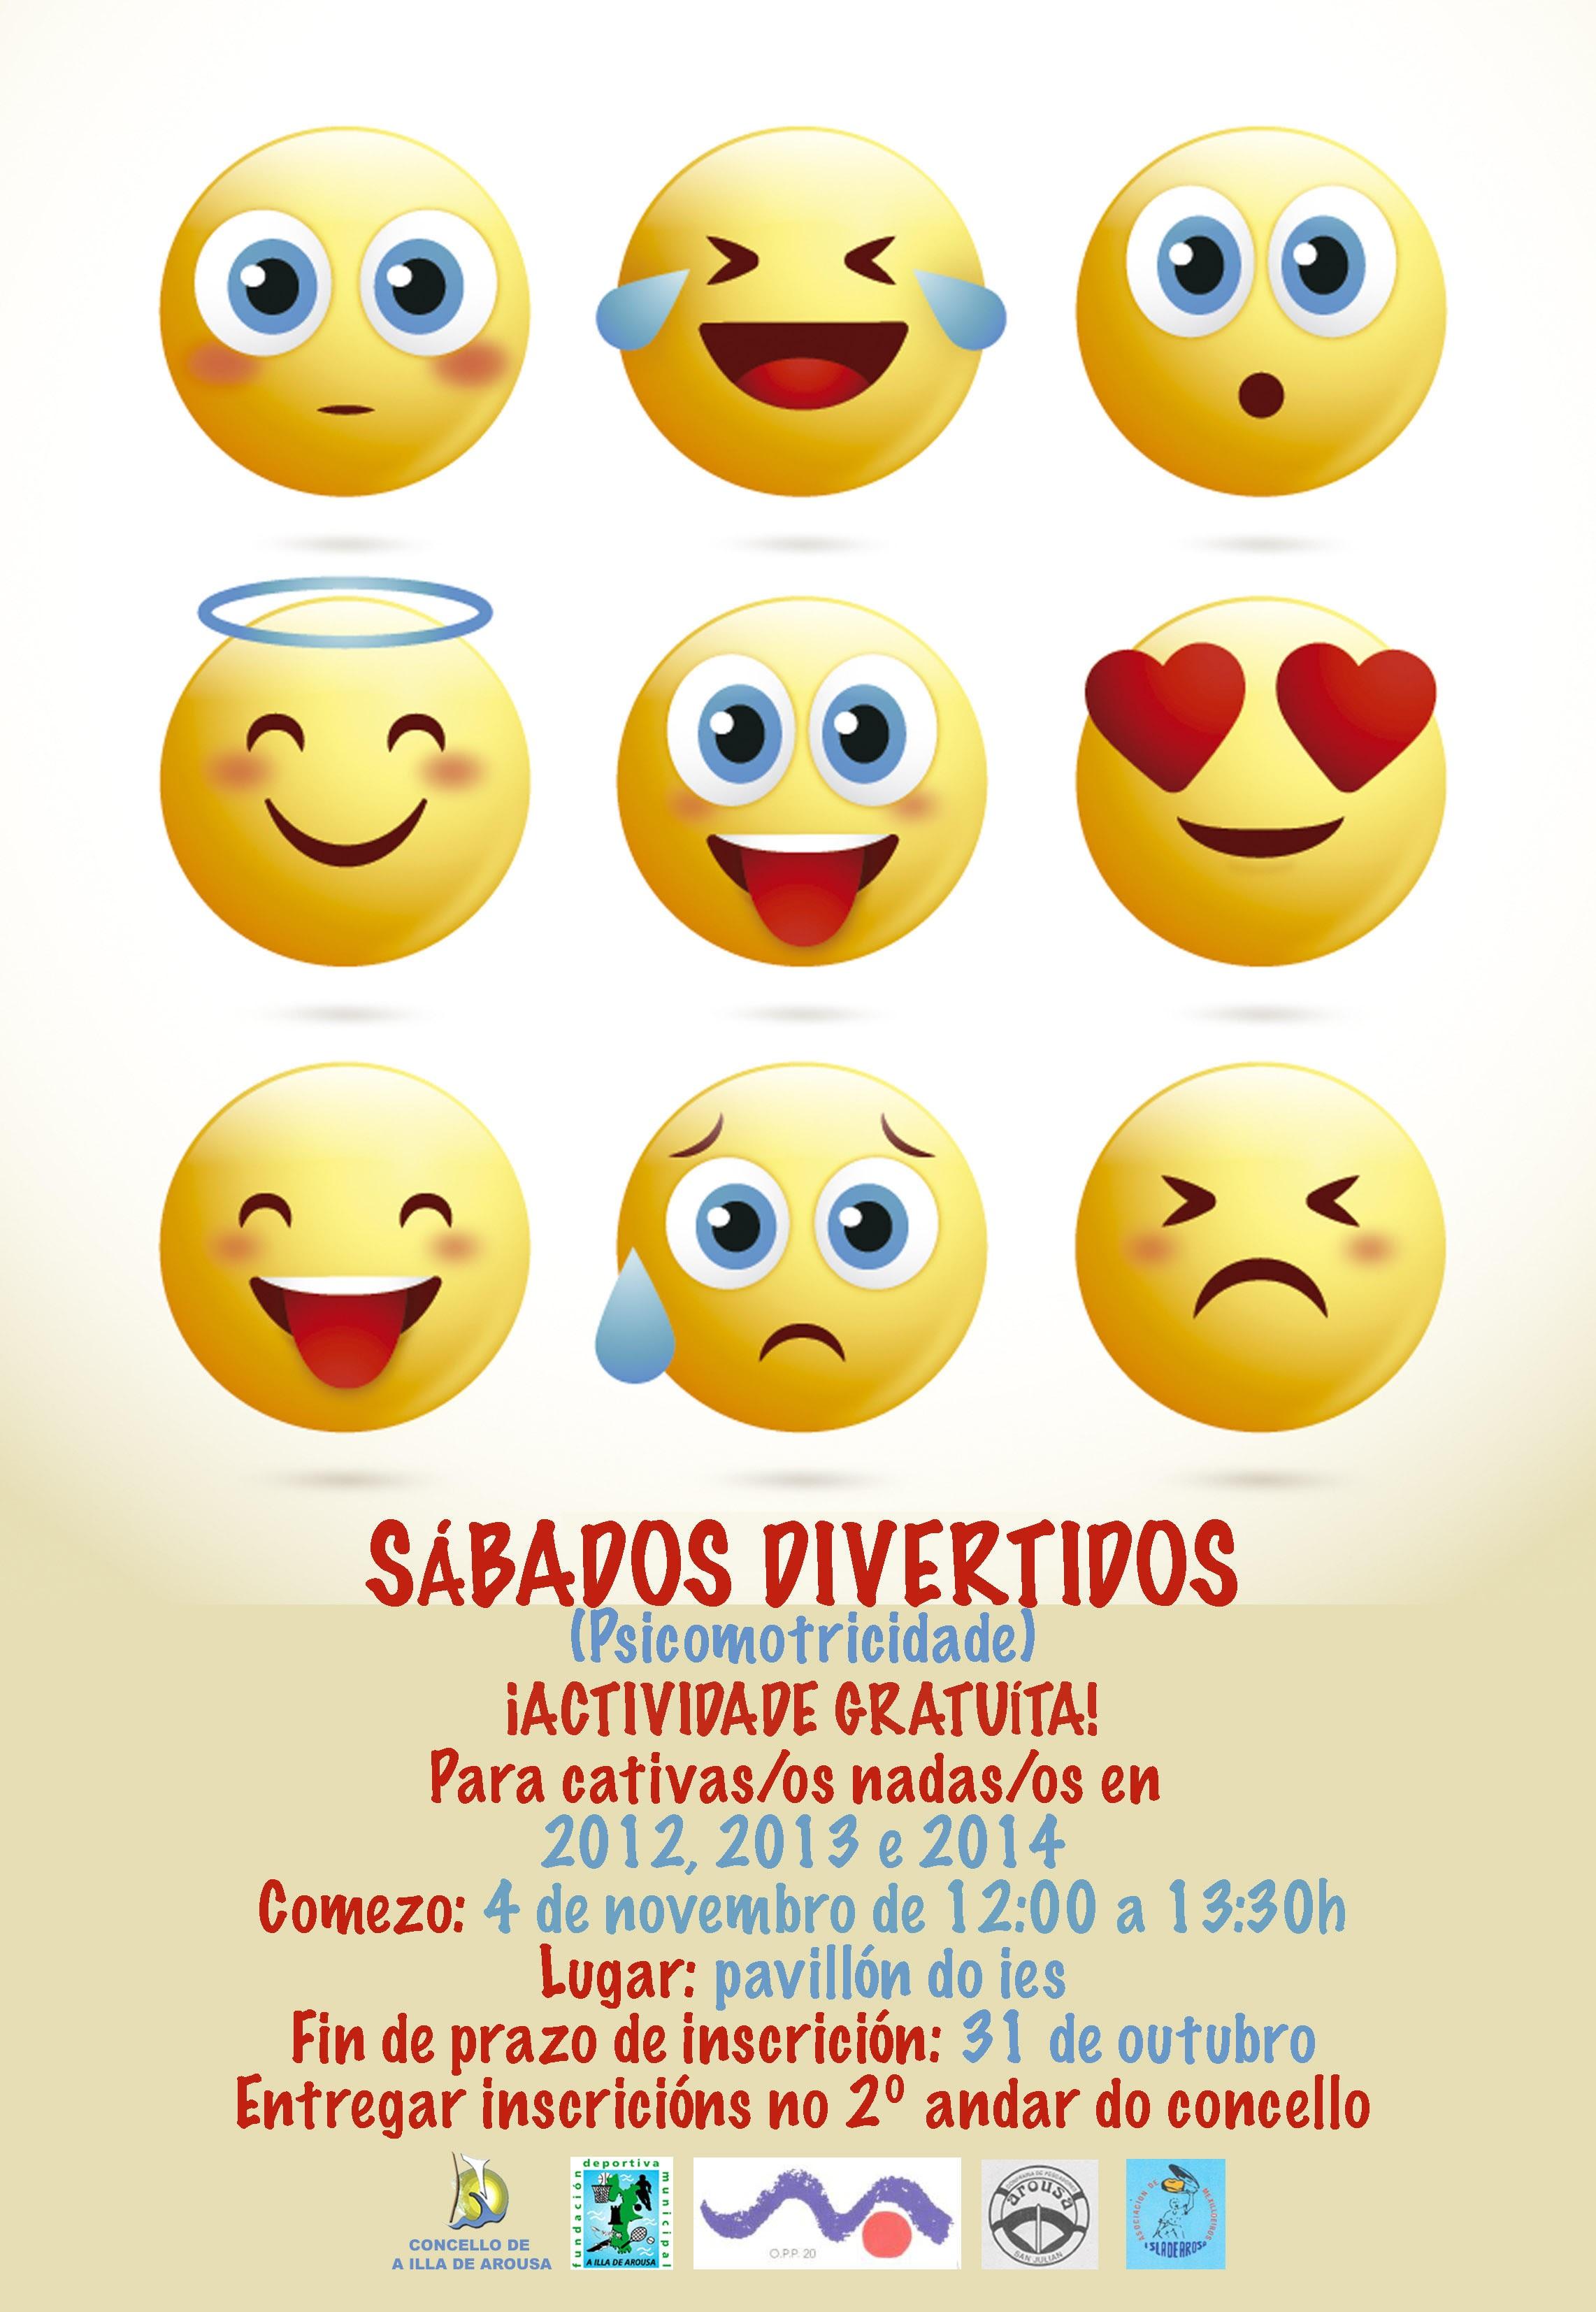 SÁBADOS DIVERTIDOS (PSICOMOTRICIDADE)